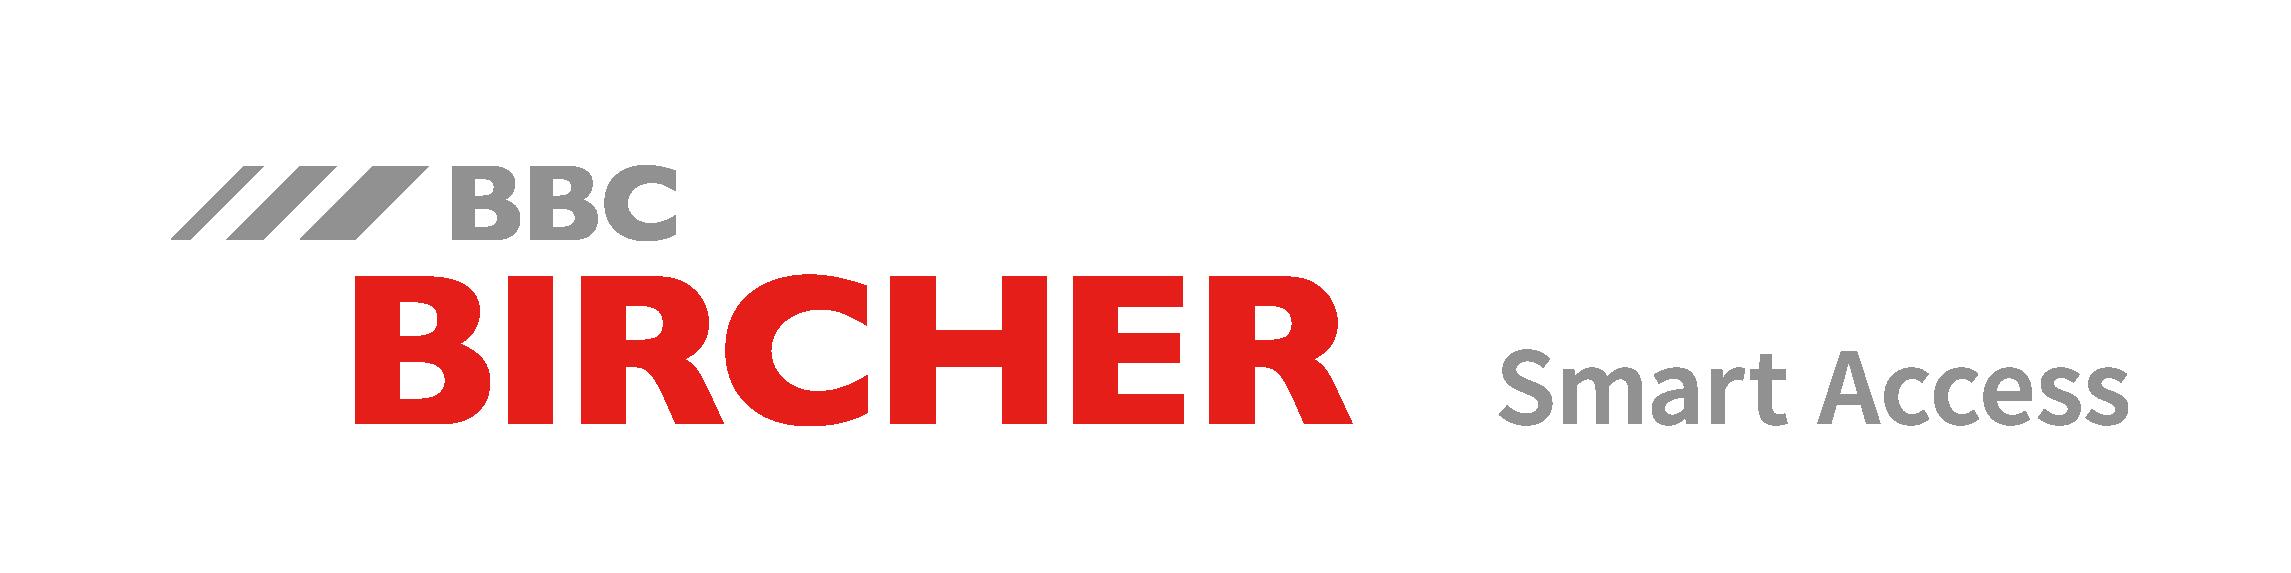 BBC Bircher Smart Access